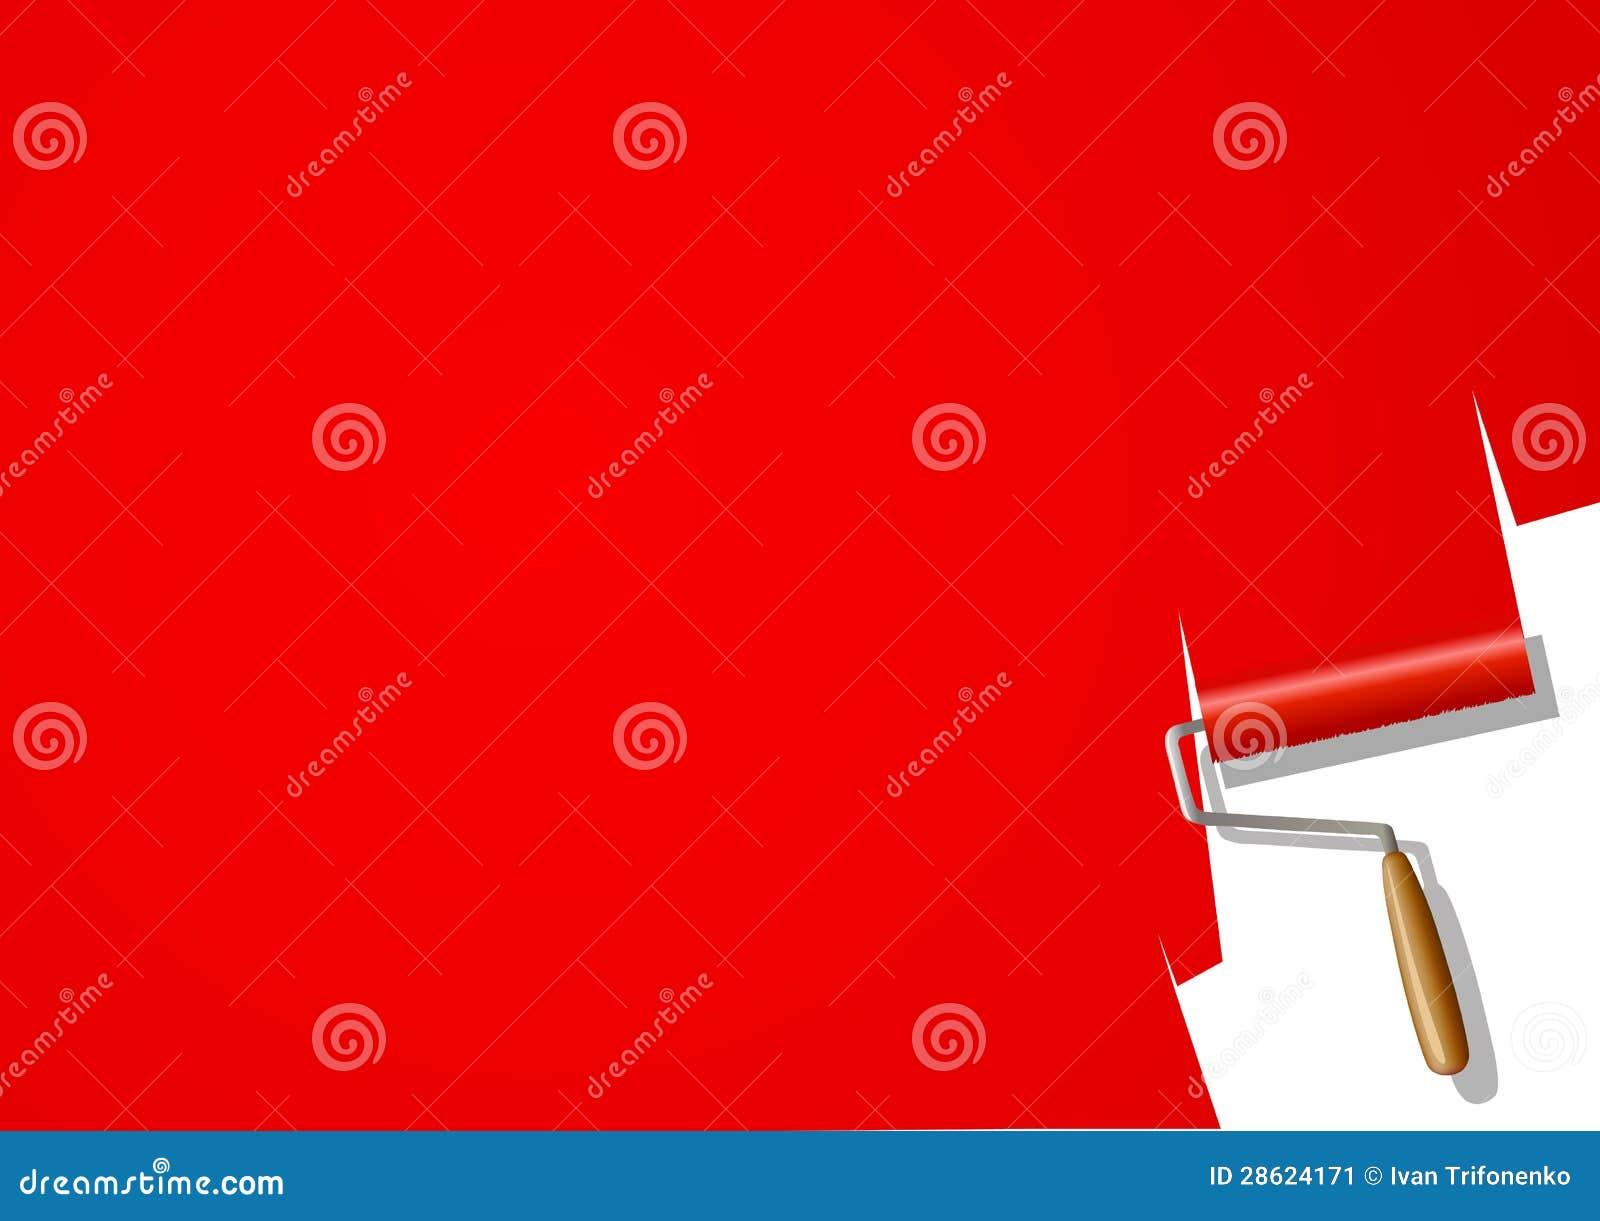 rouleau de peinture image stock image 28624171. Black Bedroom Furniture Sets. Home Design Ideas